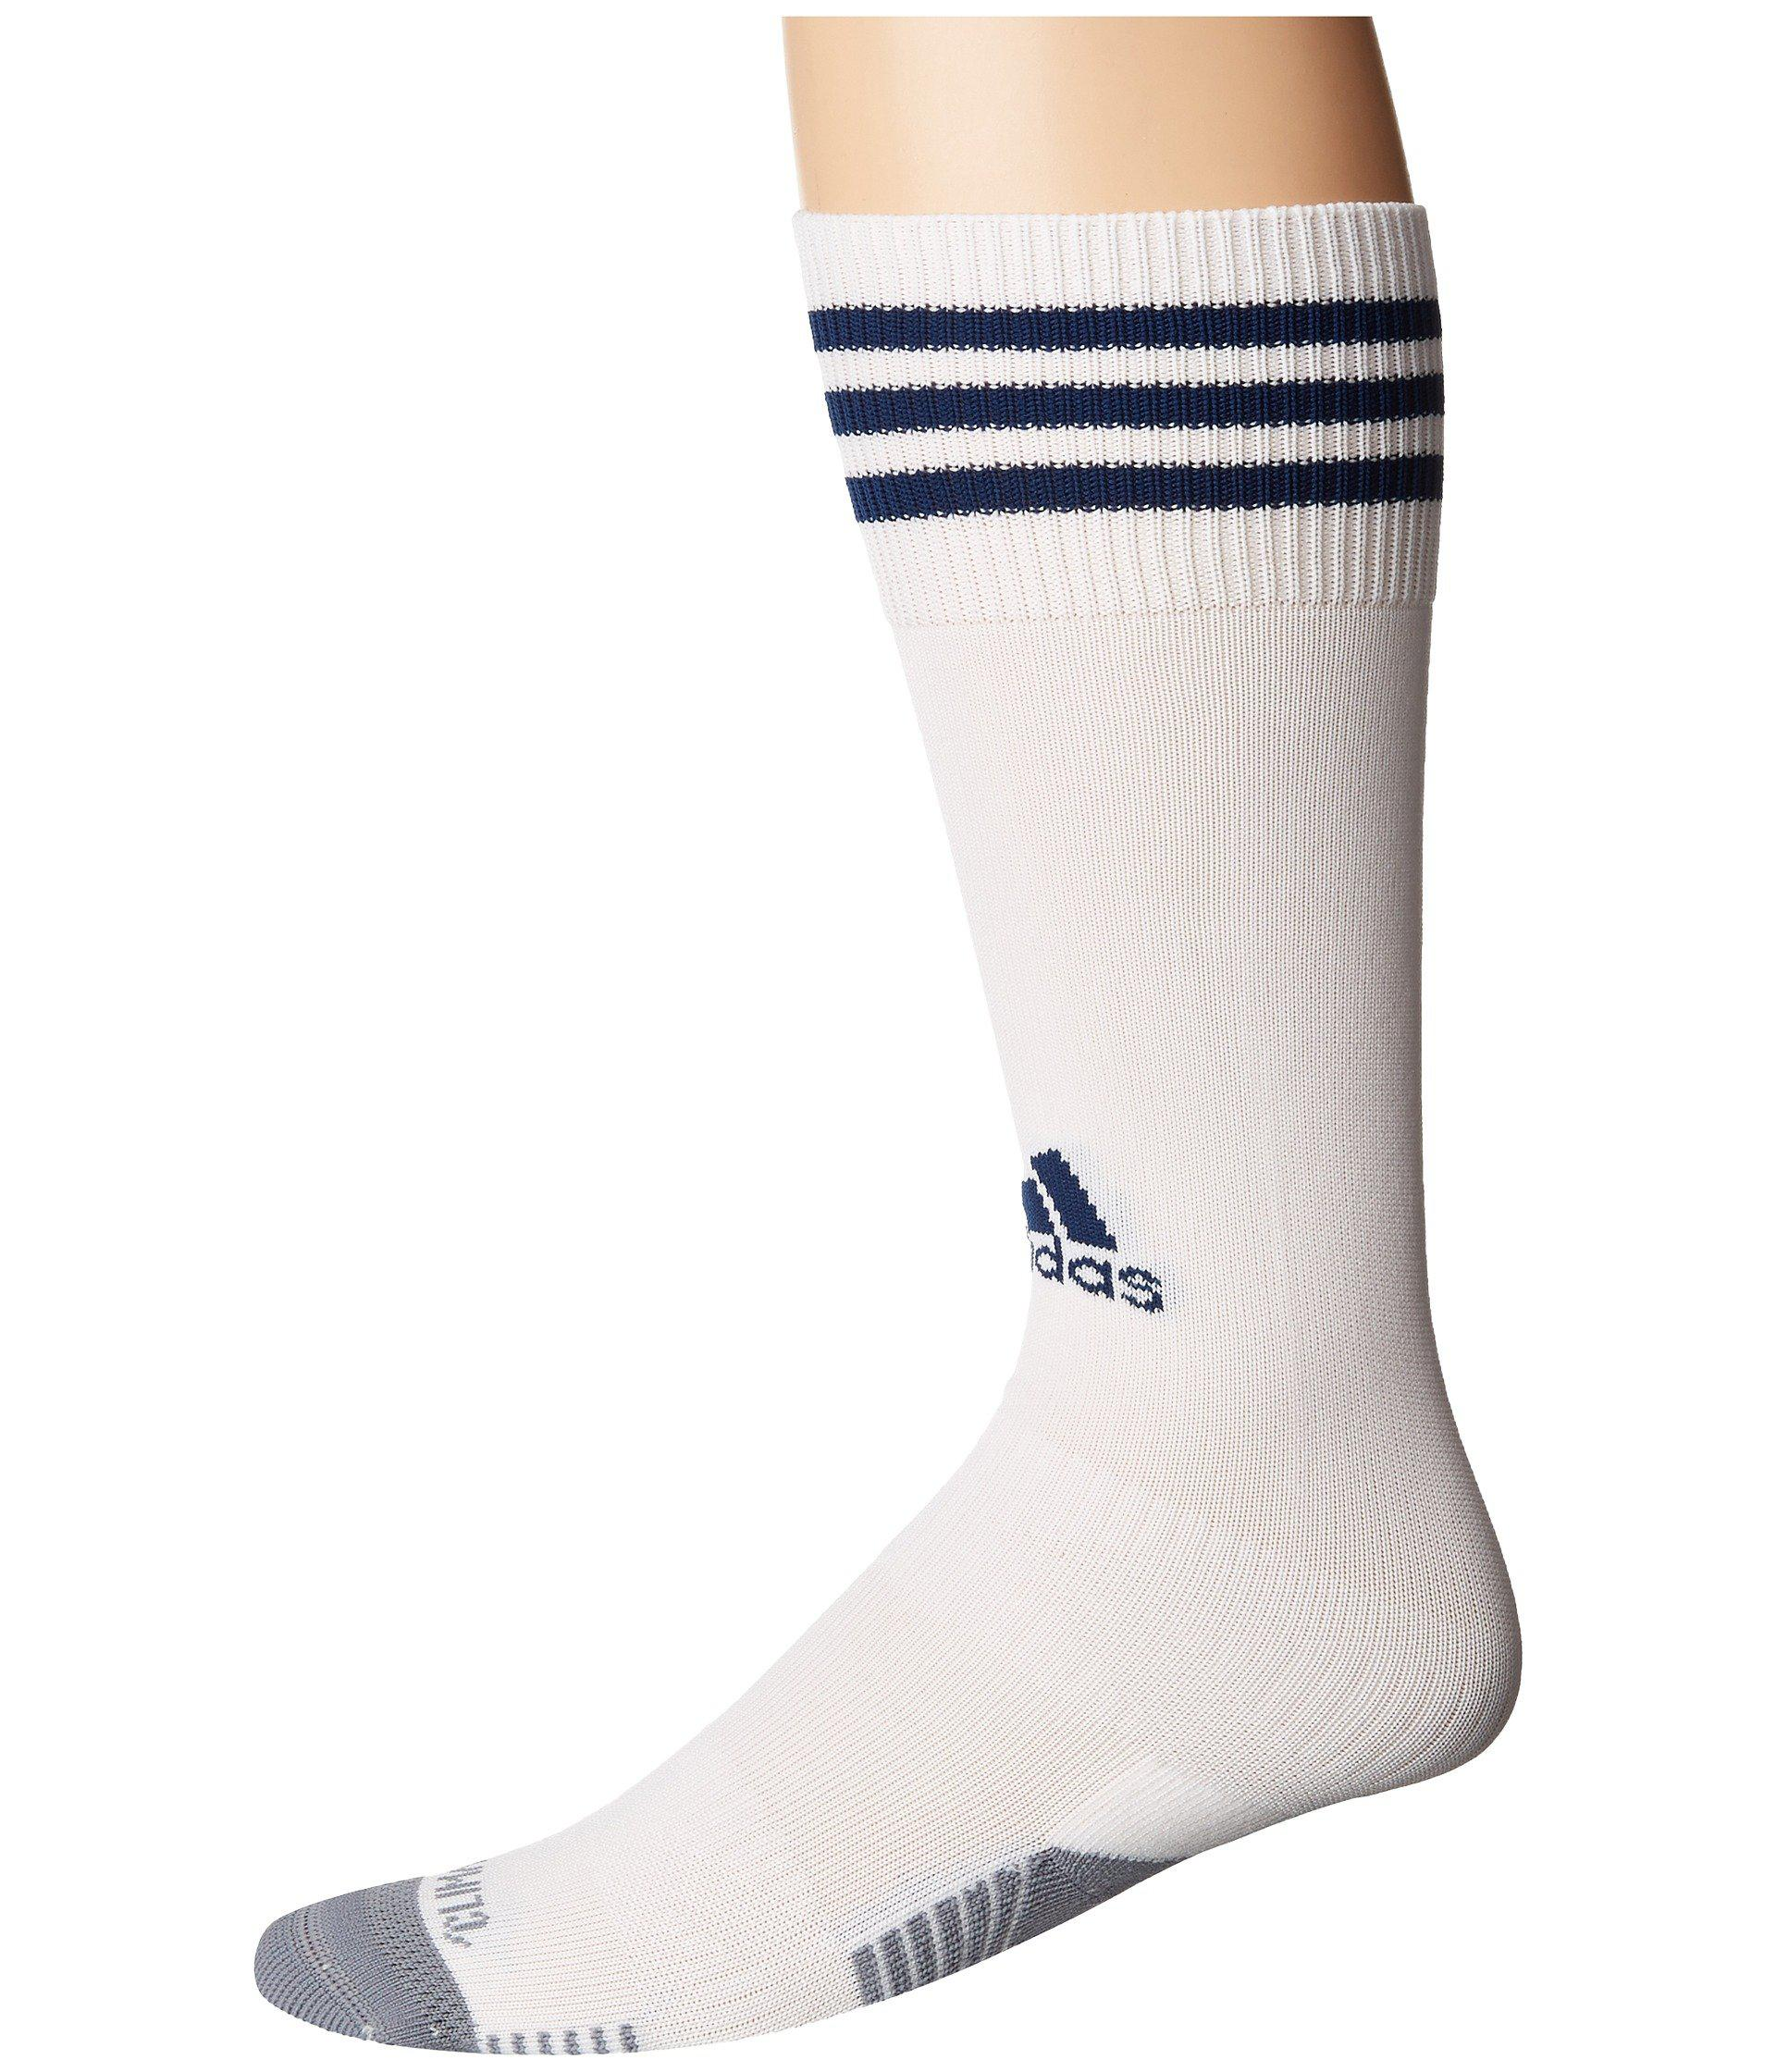 99a61b2ee Lyst - adidas Copa Zone Cushion Iii Otc Sock (white/ New Navy) Crew ...